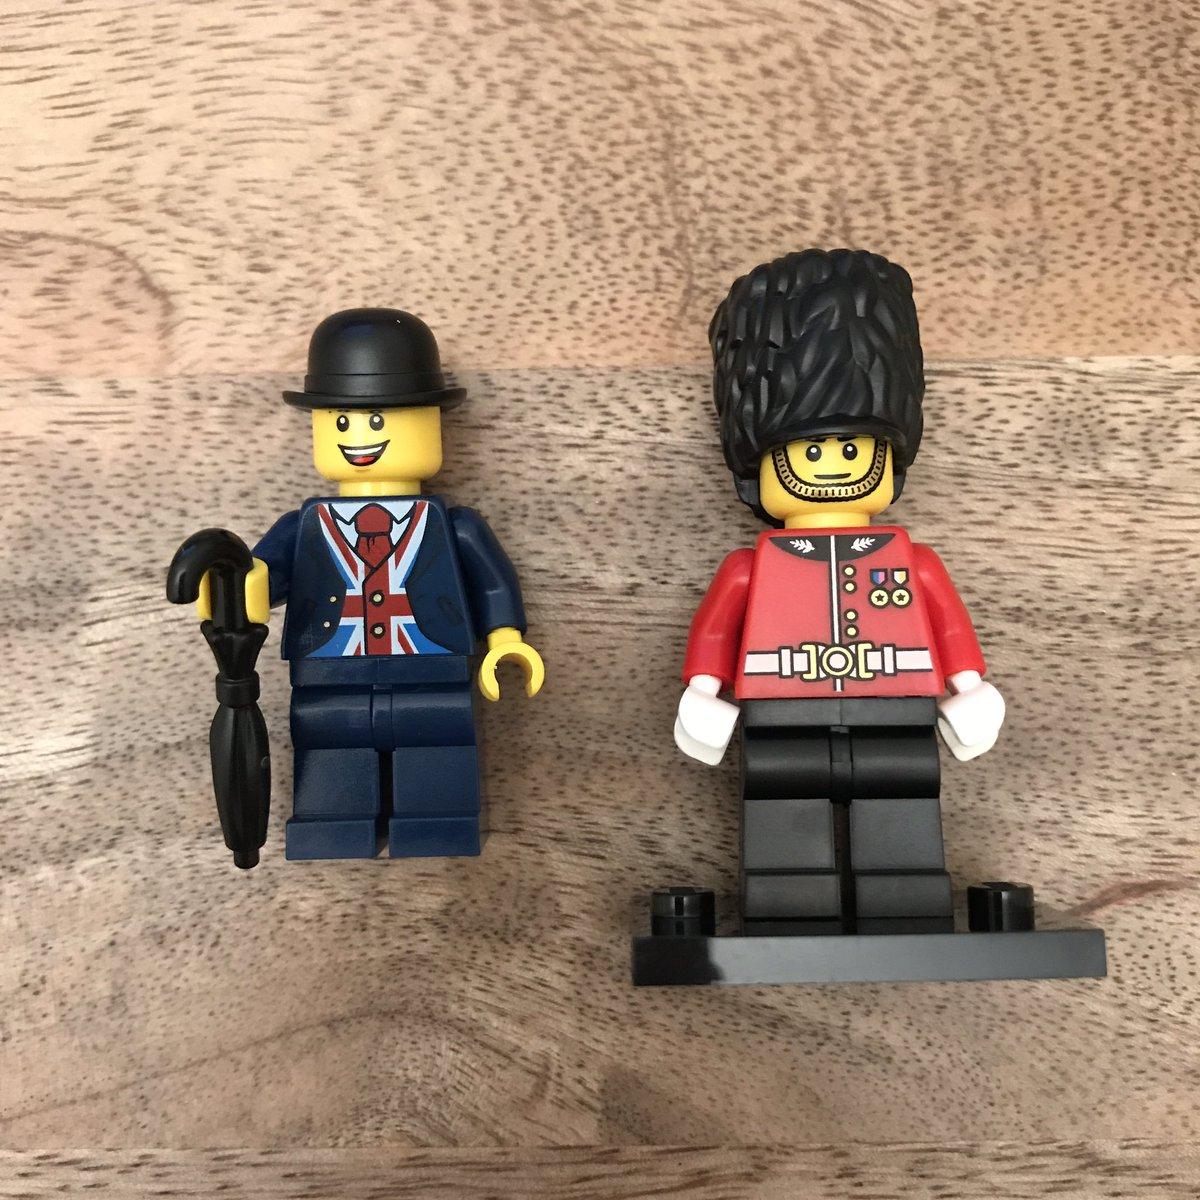 Minifigures LEGO Sets 5005233-1 Royal Guard polybag HAMLEY/'S EXCLUSIVE New MIB